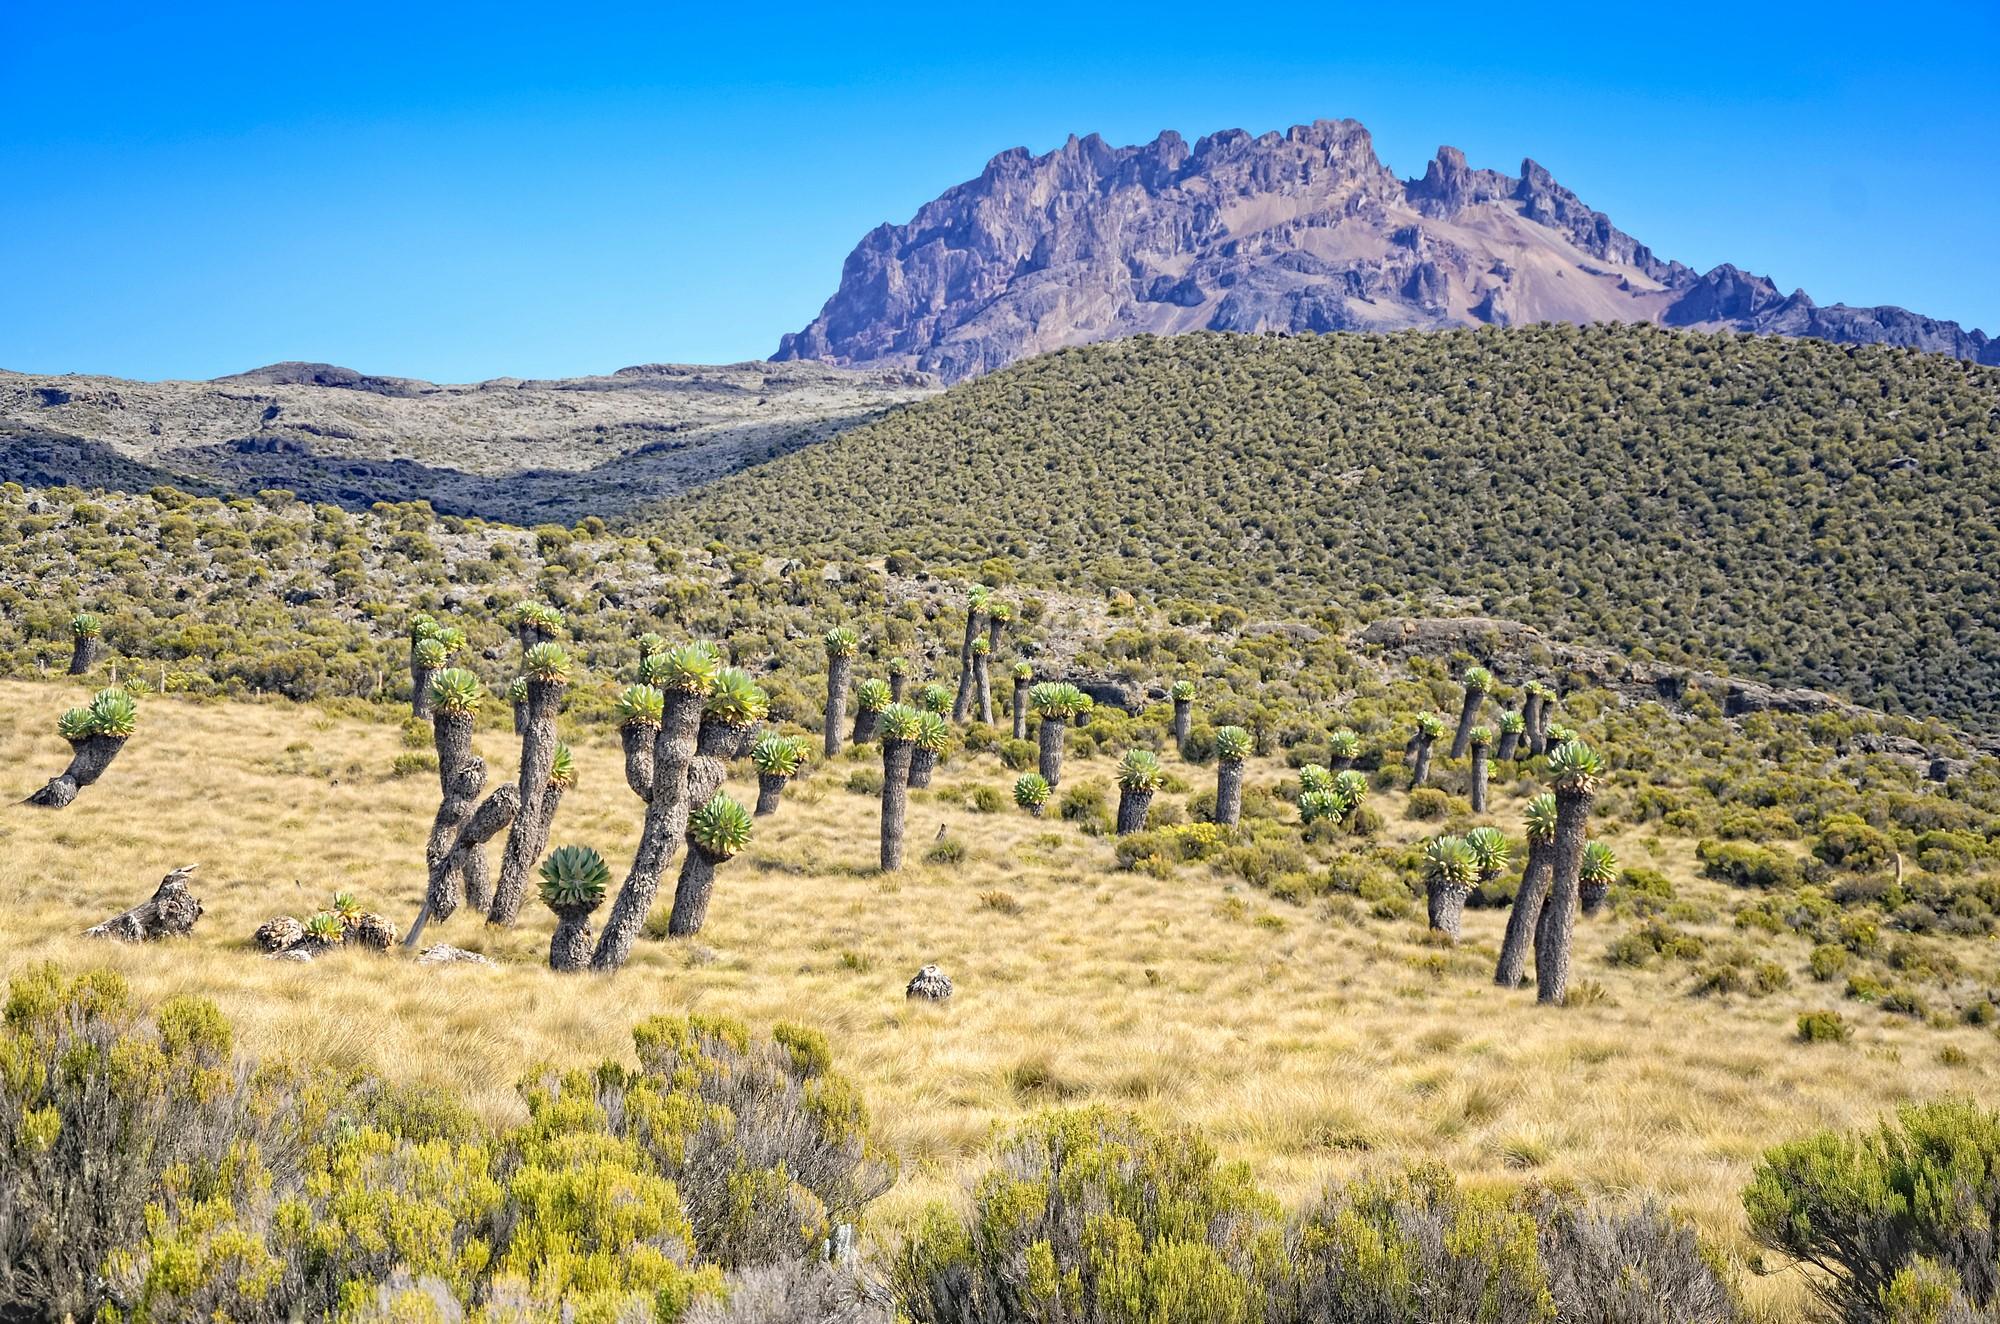 Kilimanjaro : Come arrivare